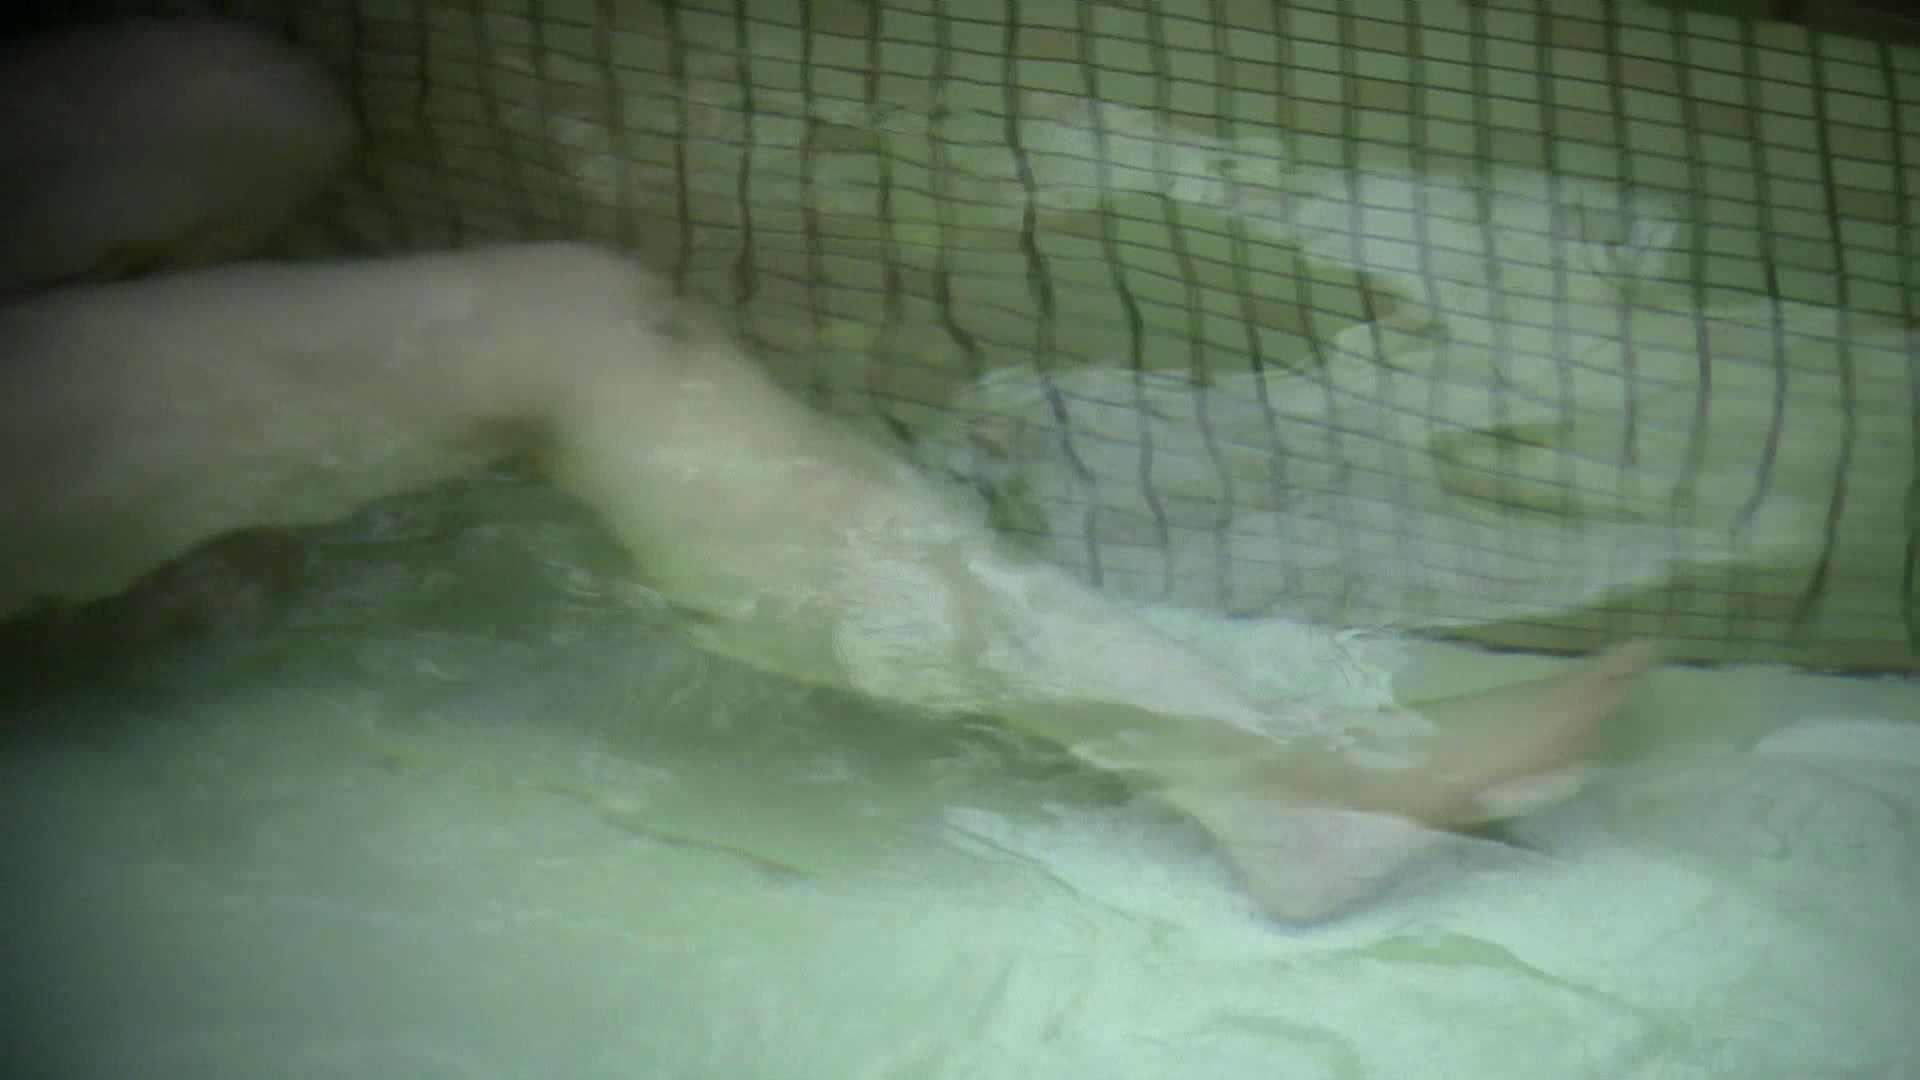 Aquaな露天風呂Vol.652 盗撮 | HなOL  105pic 31